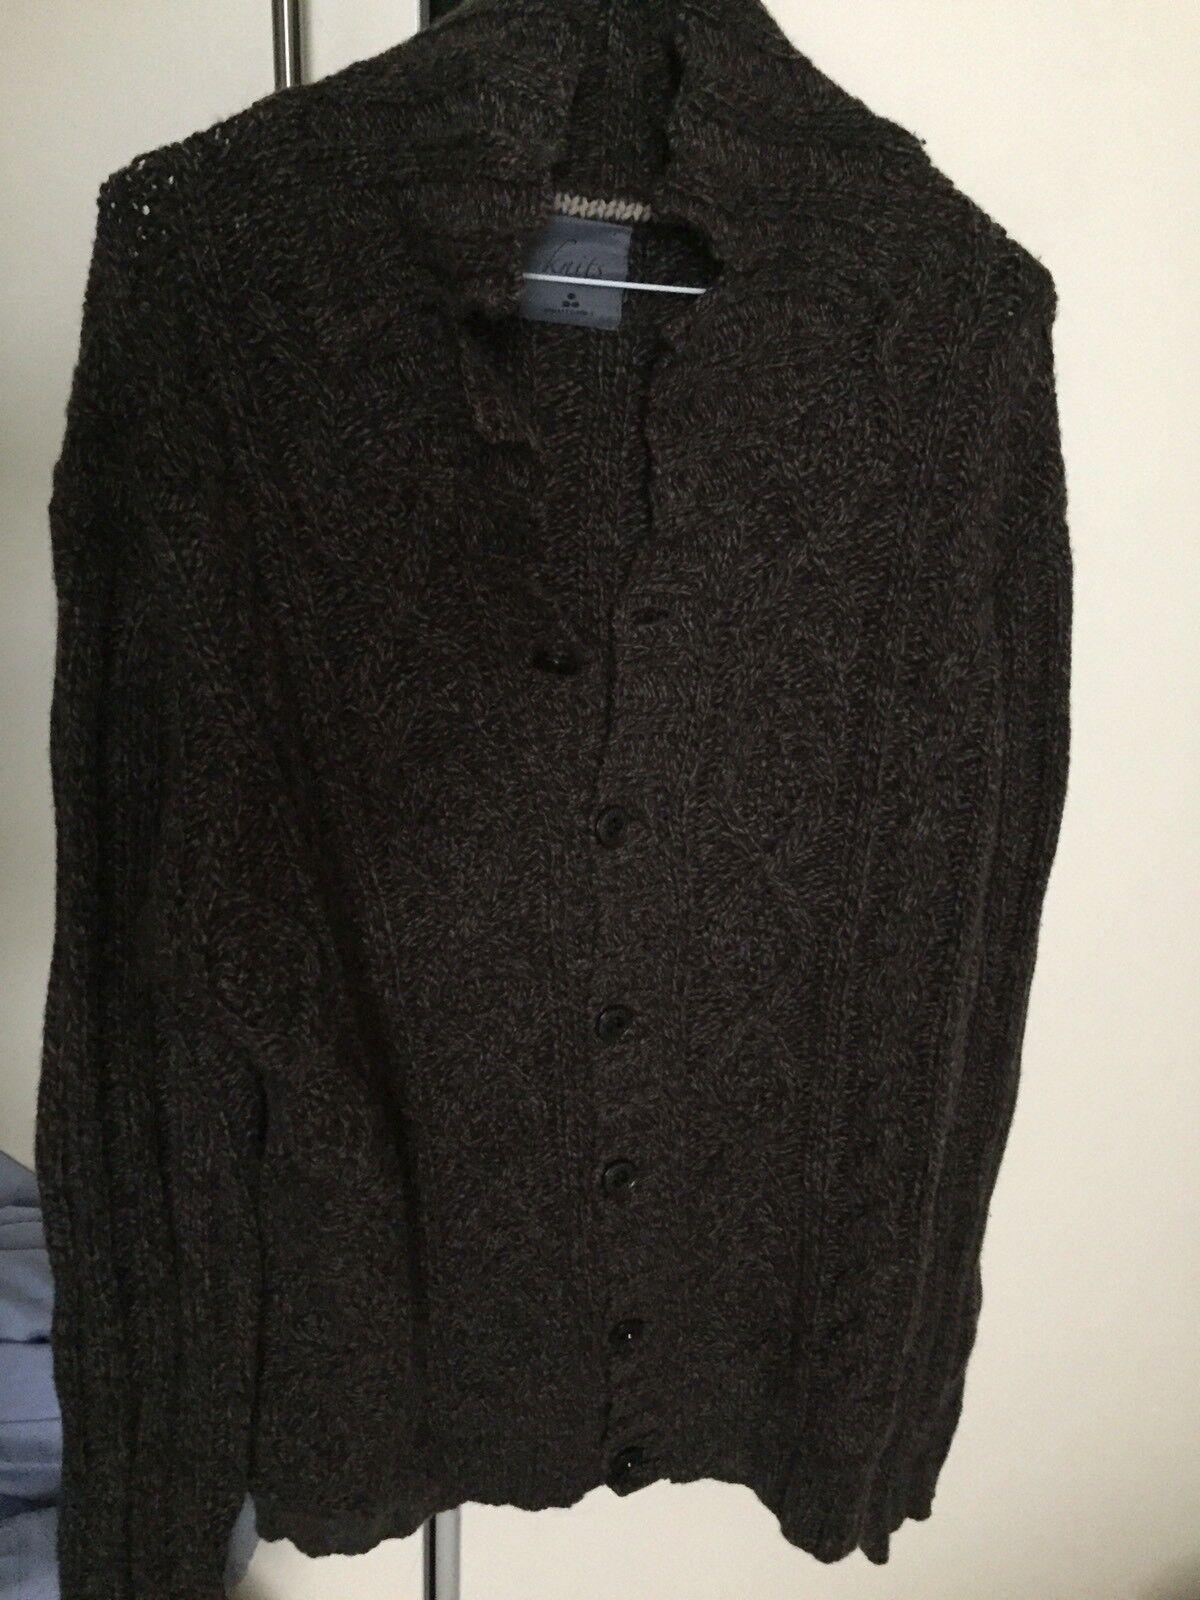 Peuterey knits Braun classic heavy knit button down cardigan Größe XL (Italian)